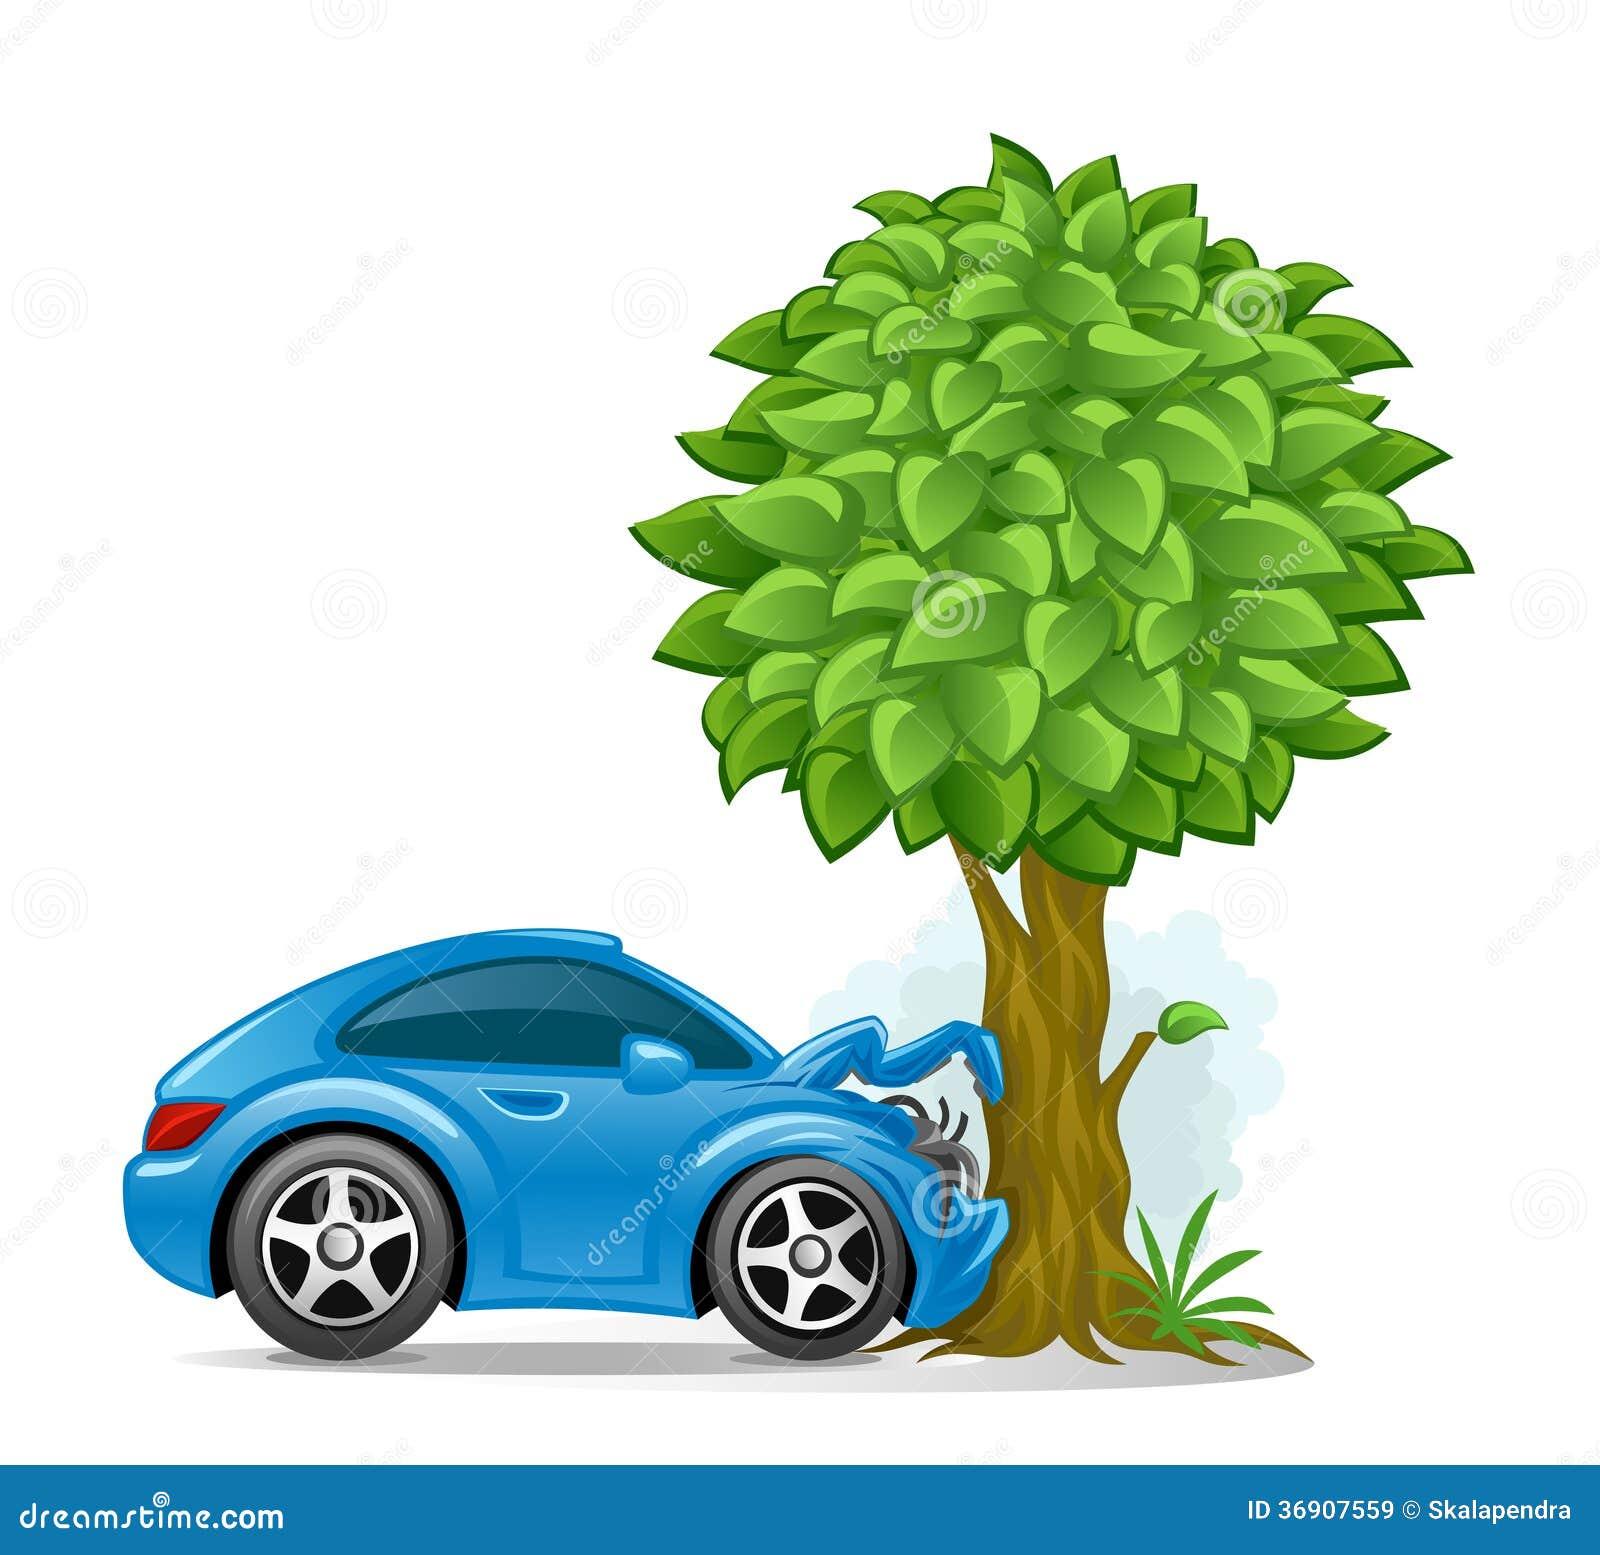 Home Design 3d Keeps Crashing: Car Crashed Into Tree Royalty Free Stock Images